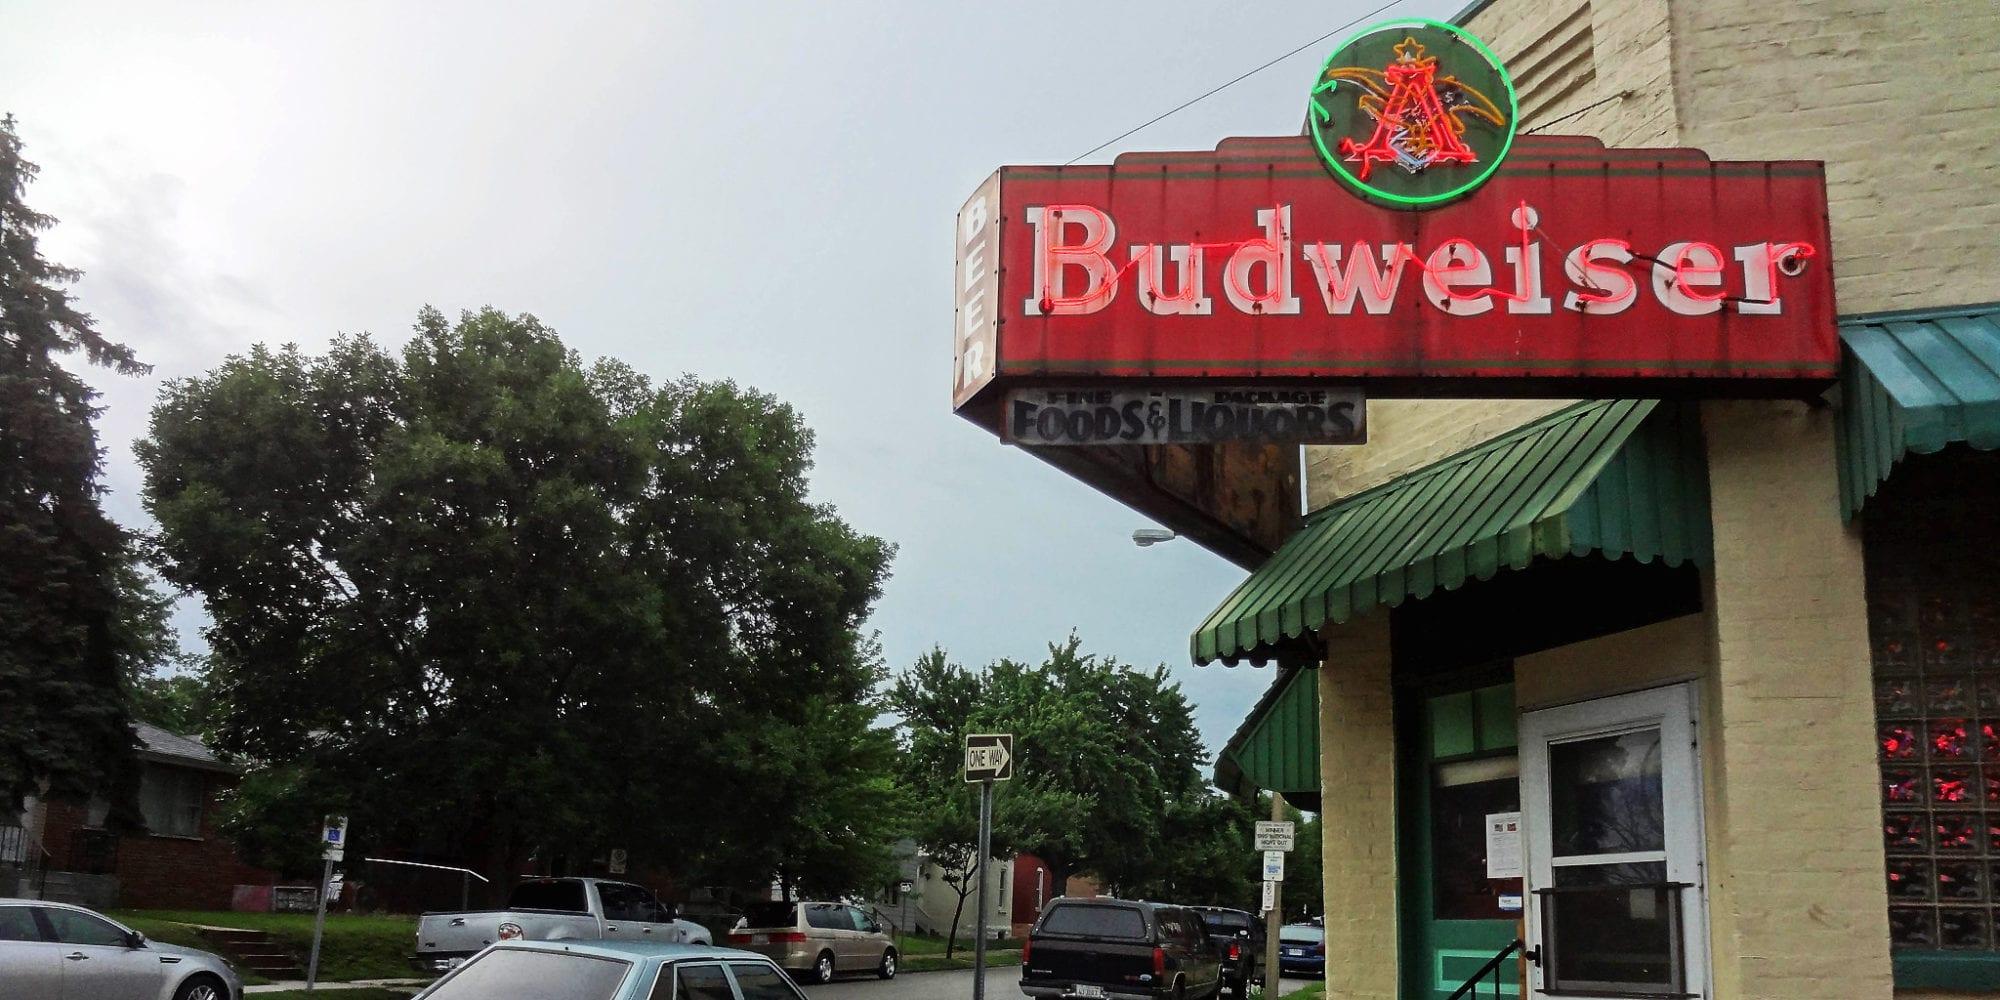 Iowa Buffet in Gravois Park, St. Louis. Photo by Paul Sableman.